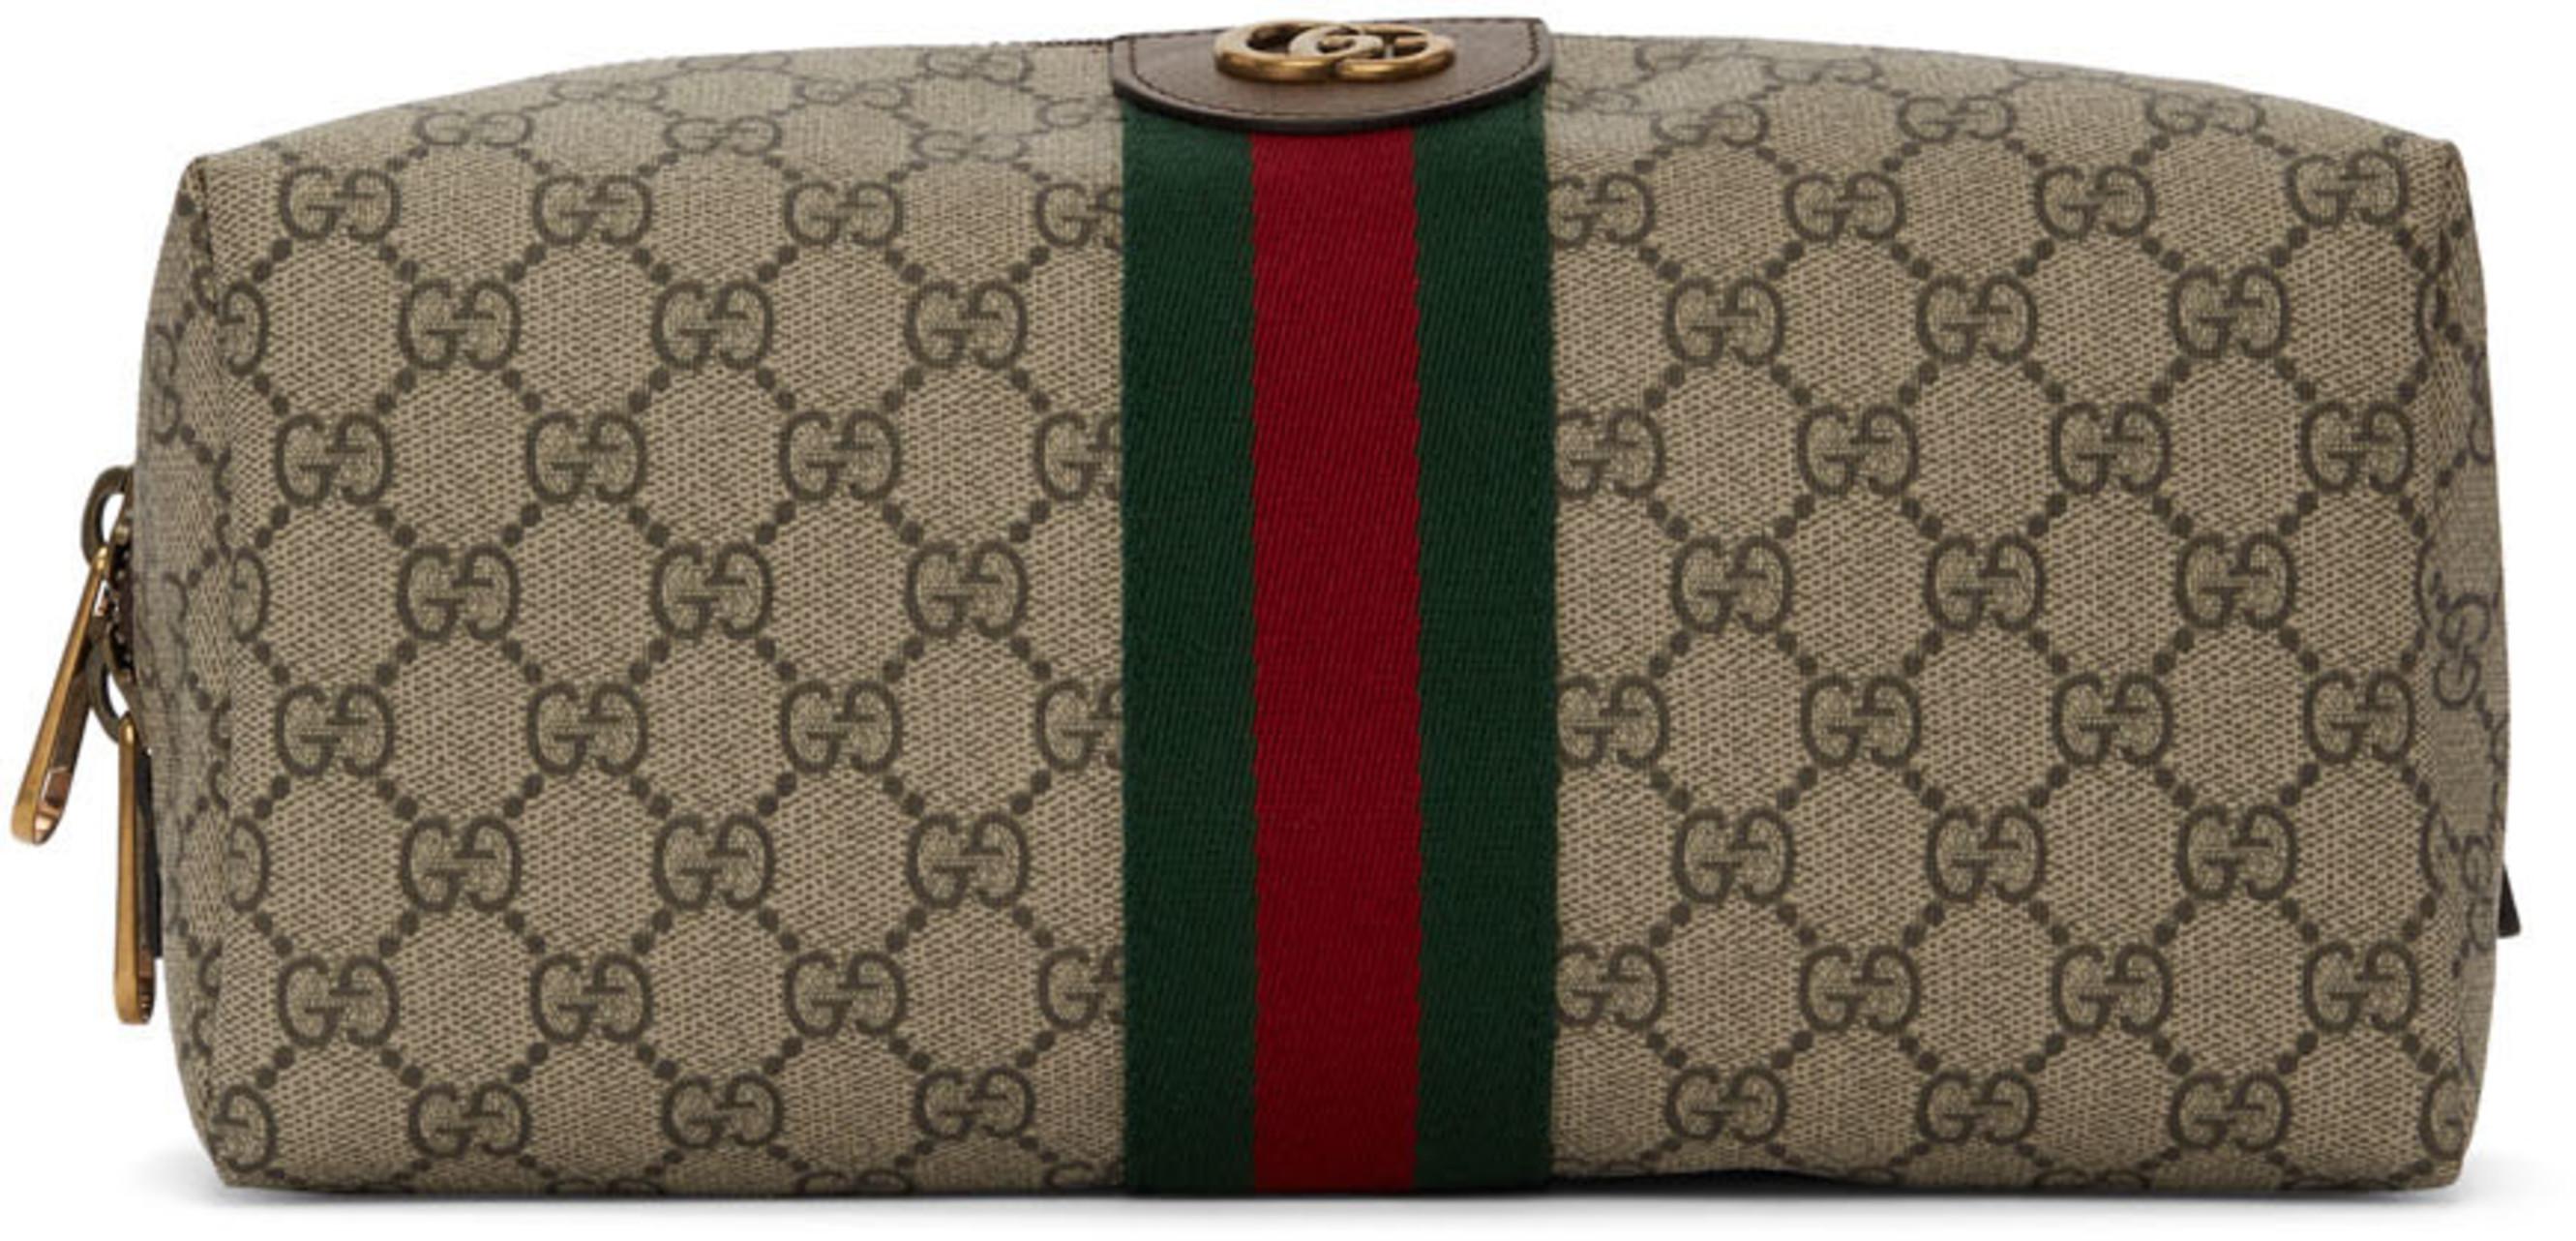 8eee6480c2 Gucci Collection pour Hommes | SSENSE France